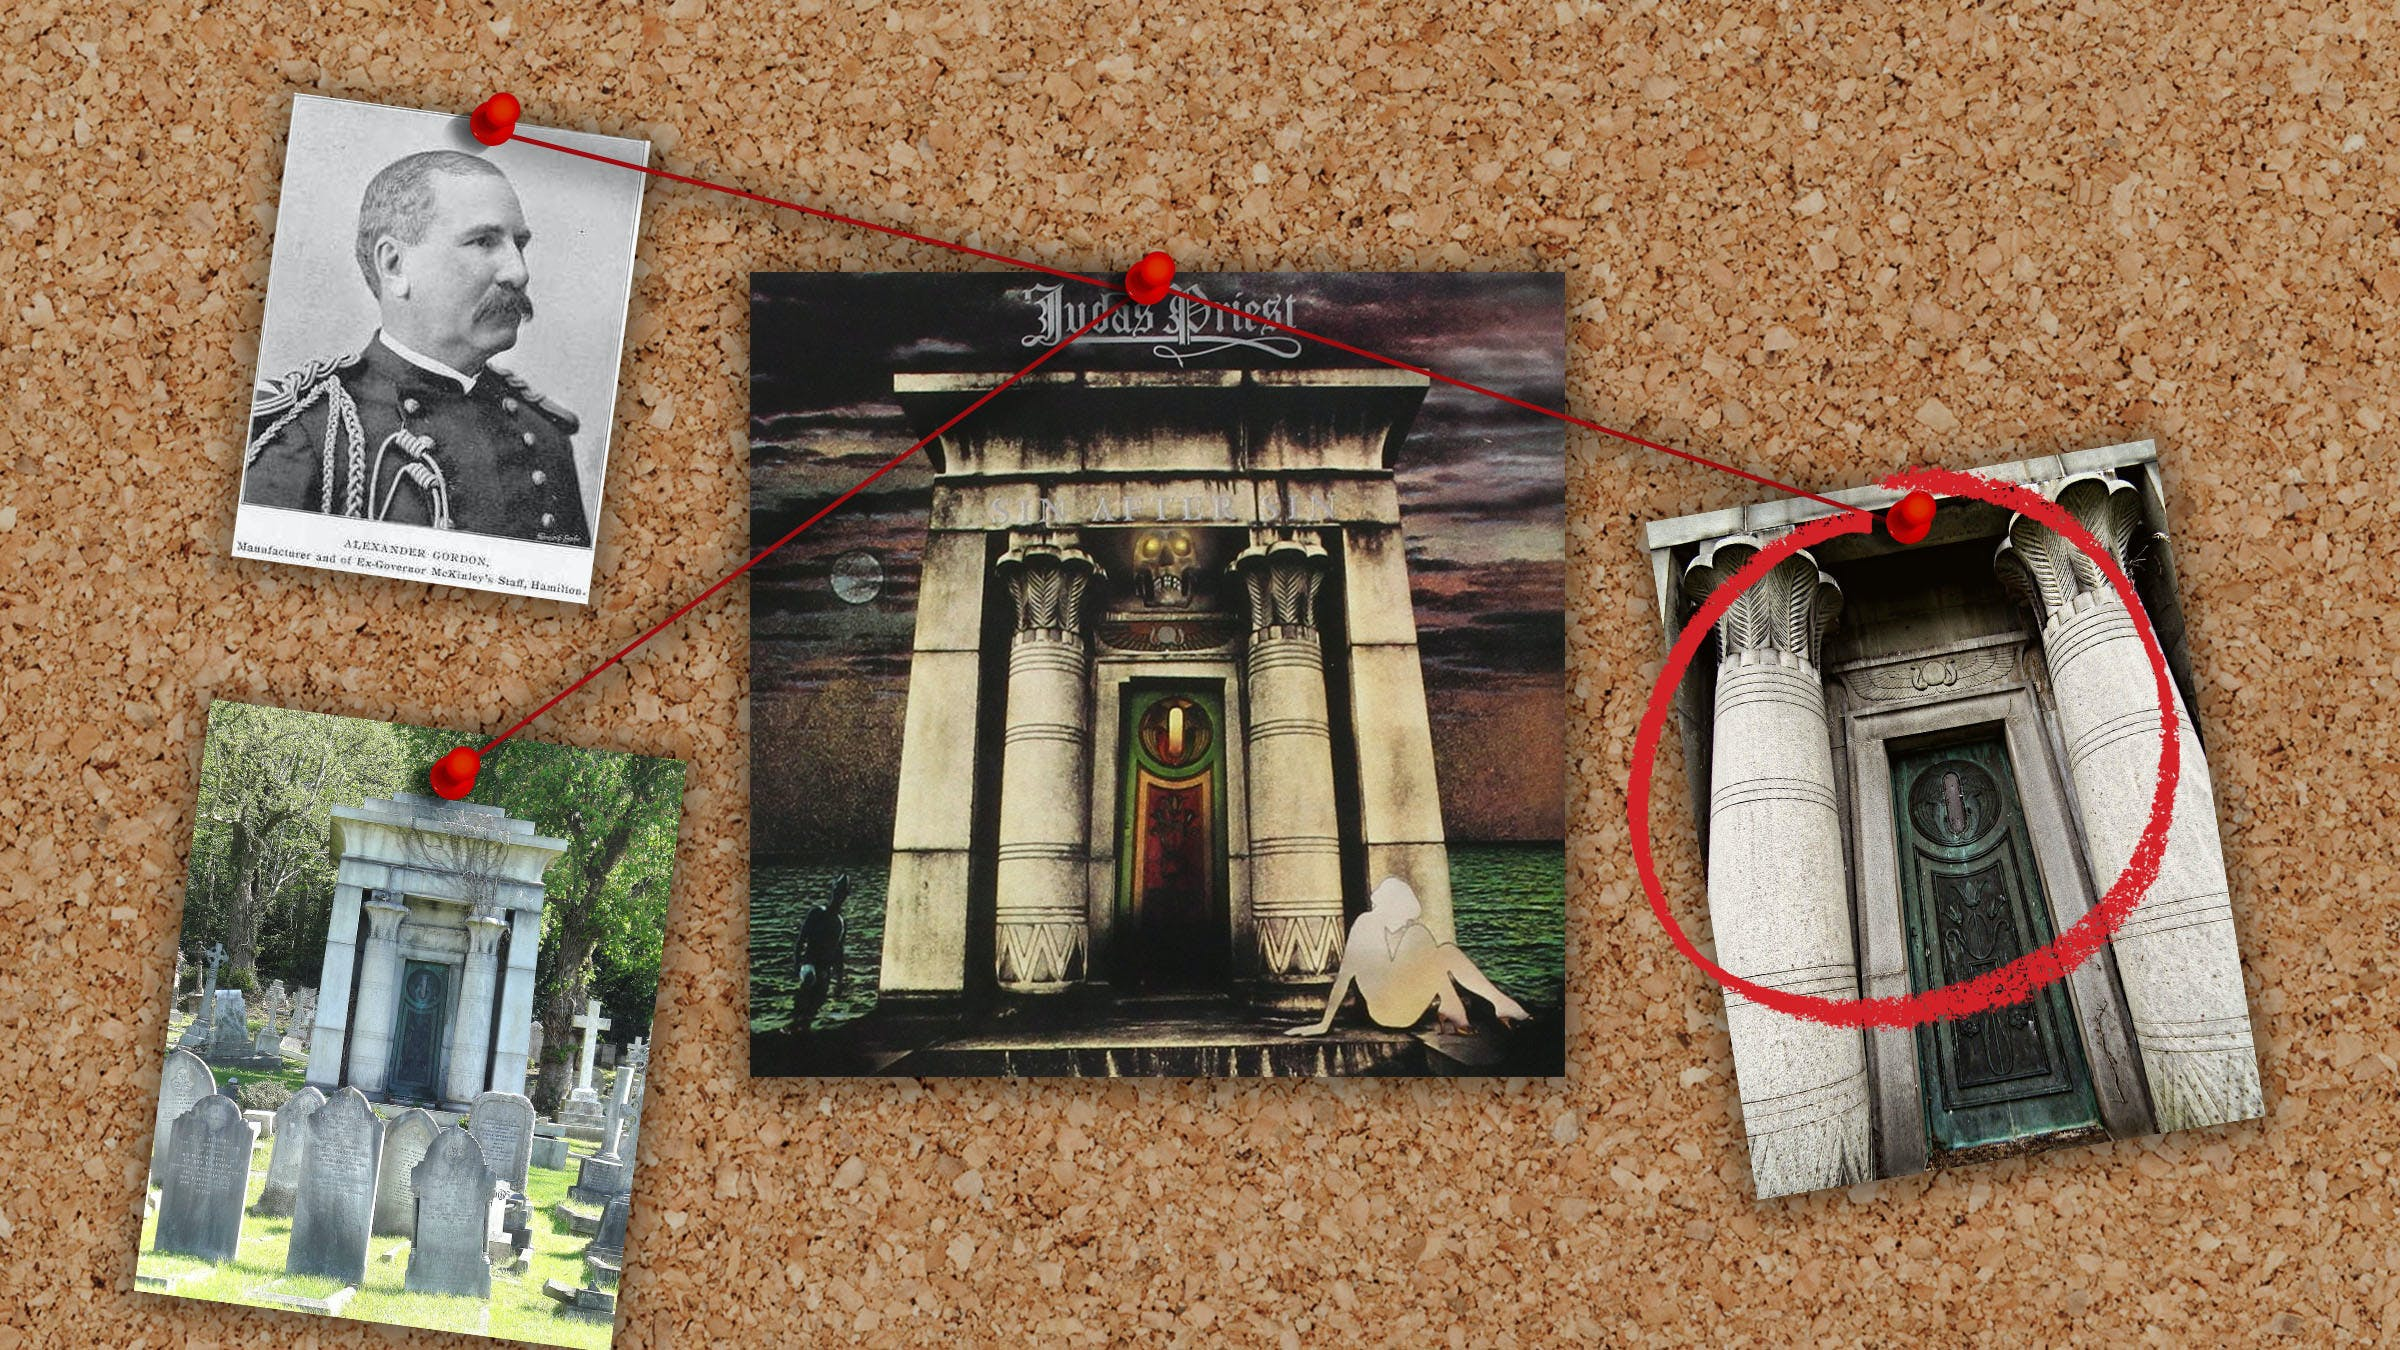 Kerrang Monte Judas Priest 2